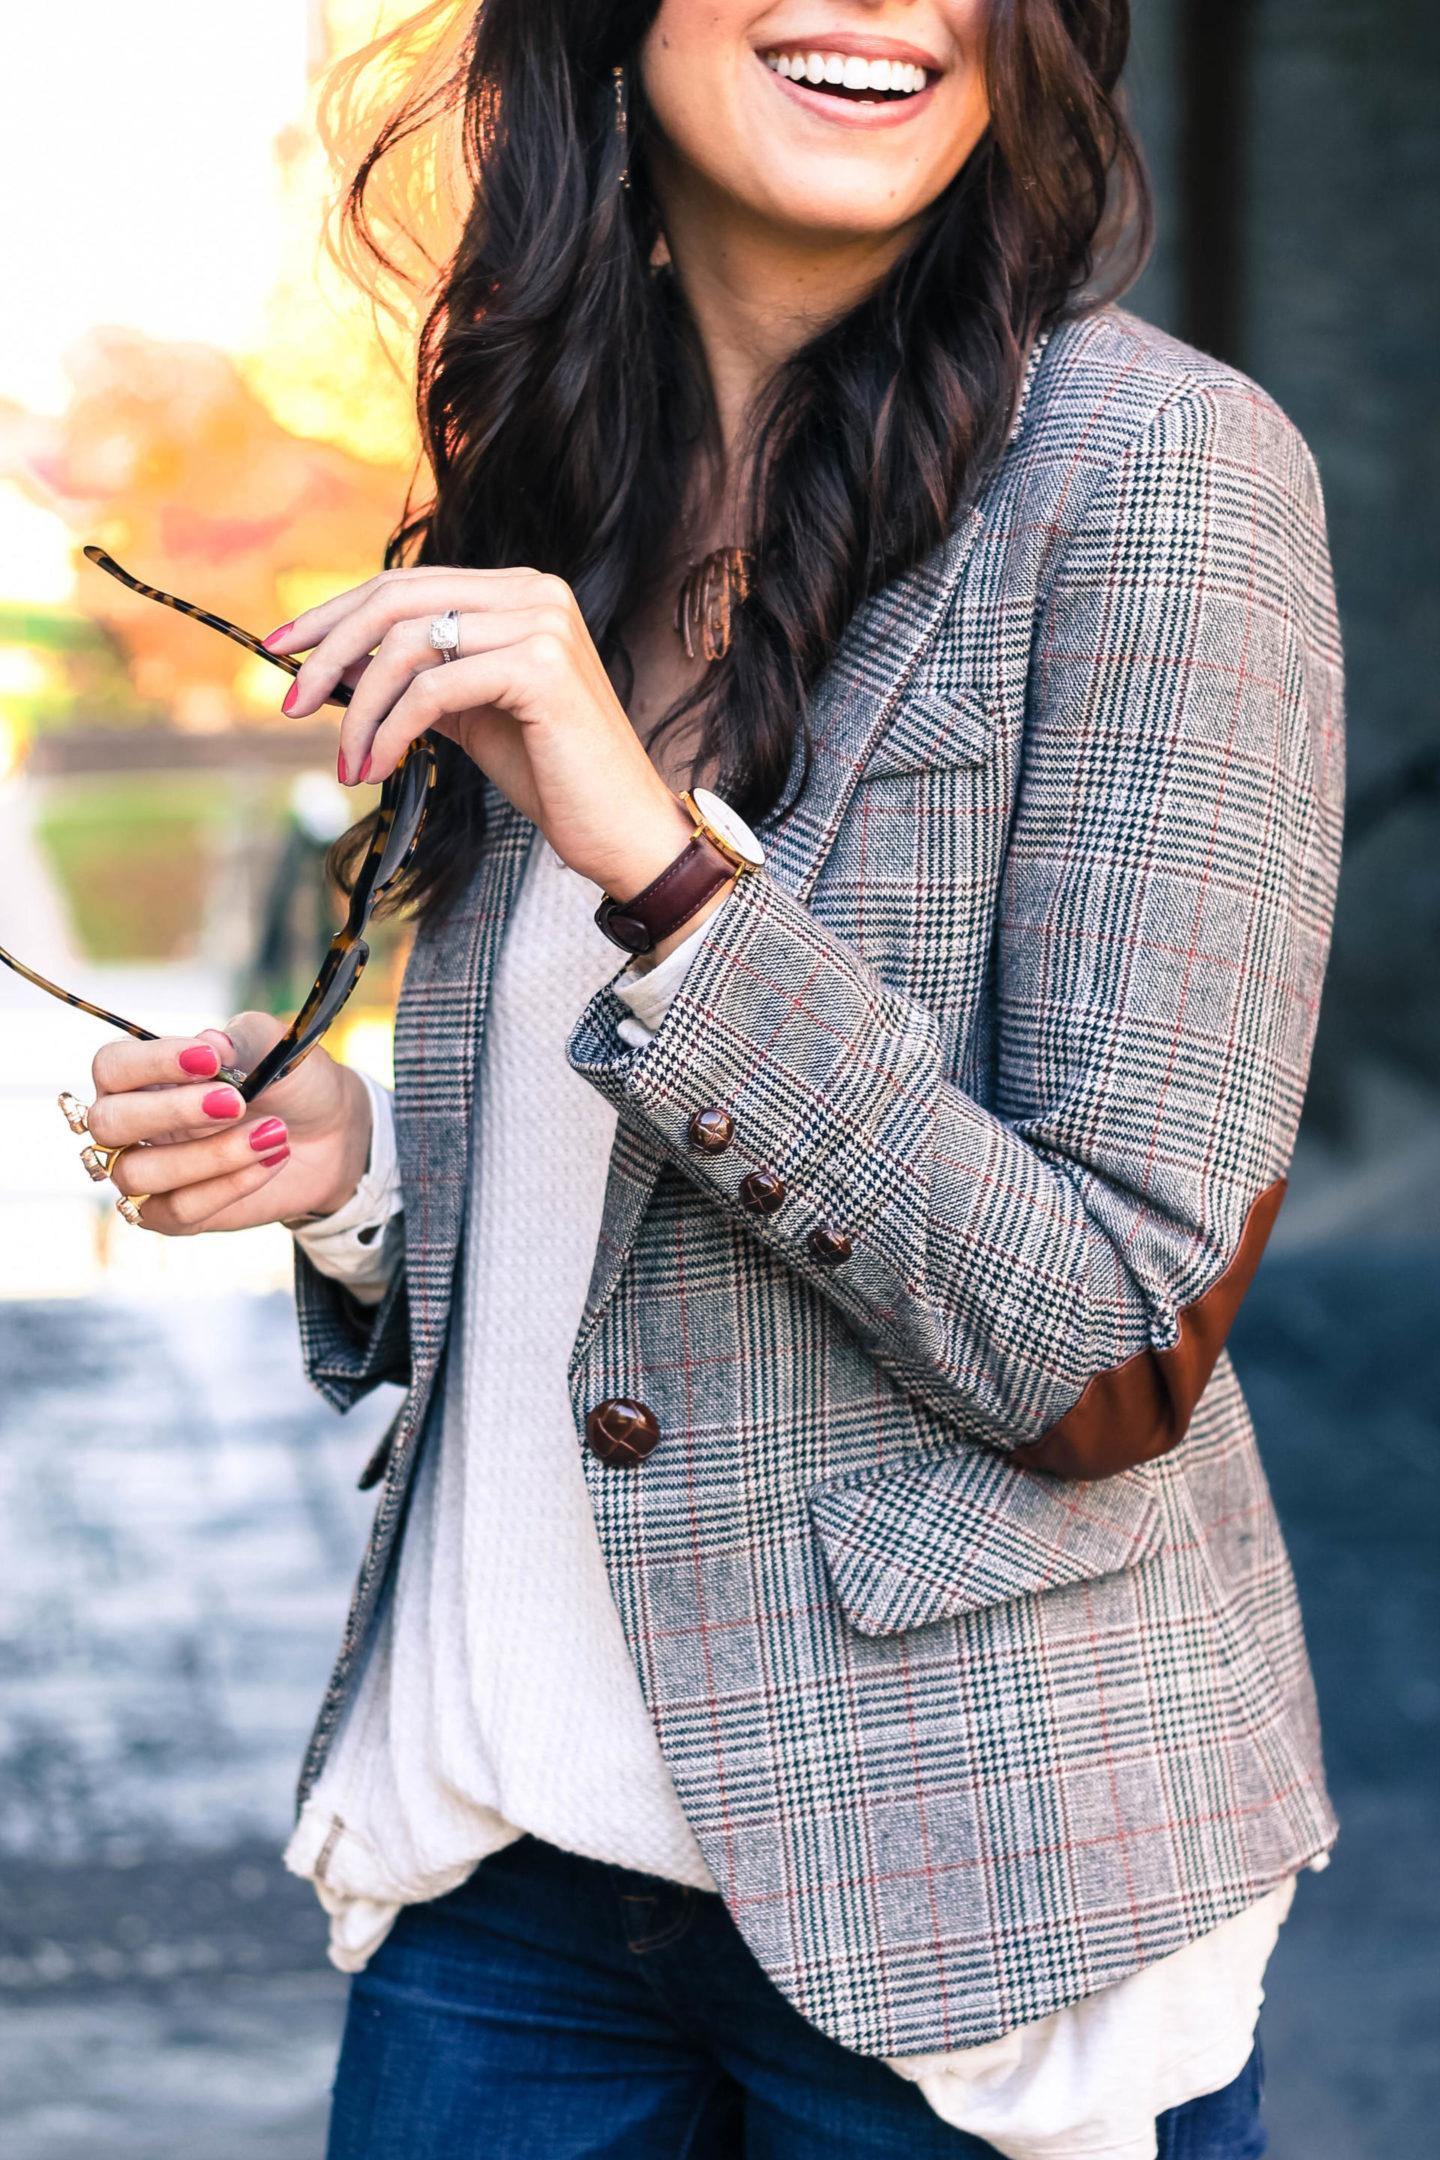 The Plaid Blazer Your Closet Needs by New York fashion blogger Style Waltz